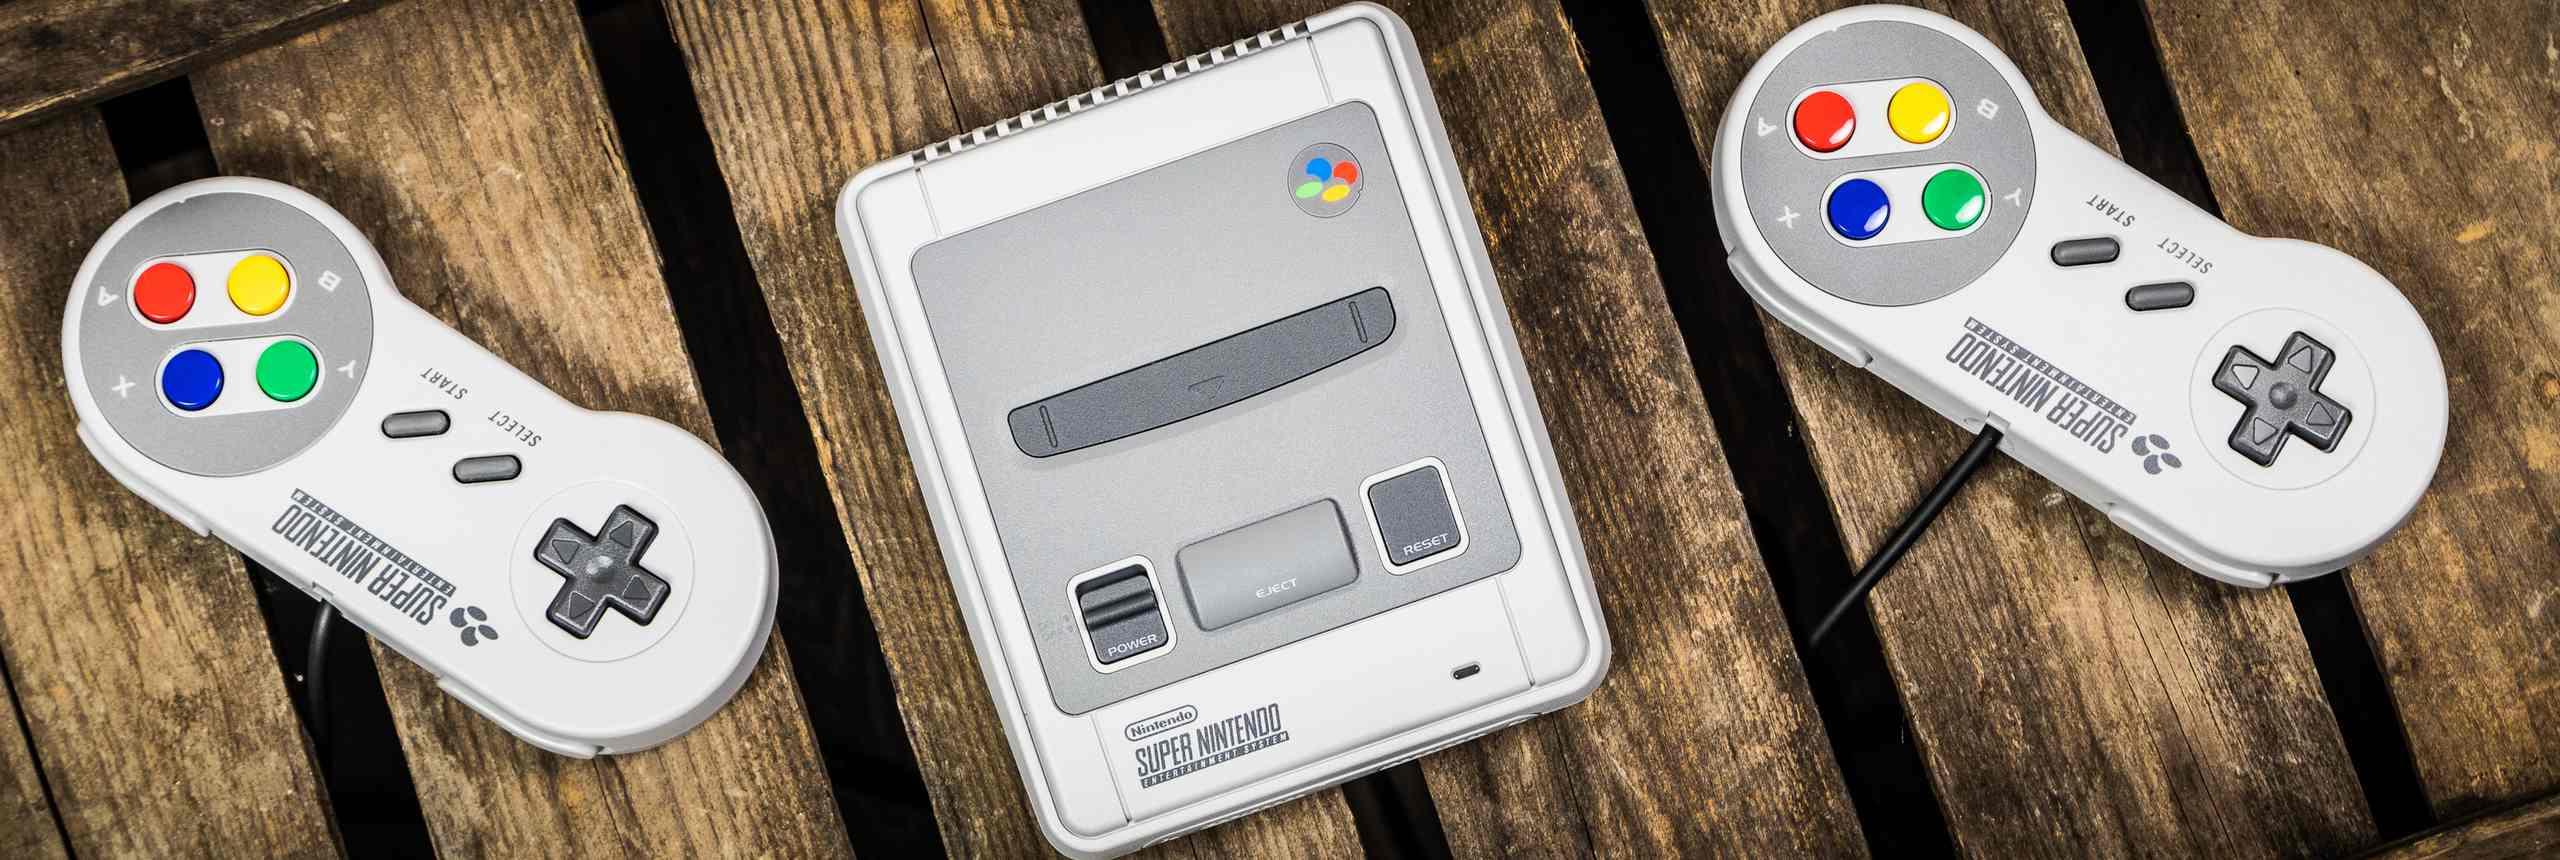 Name:  Nintendo Classic Mini - Super Nintendo Entertainment System.jpg Views: 51 Size:  189.2 KB